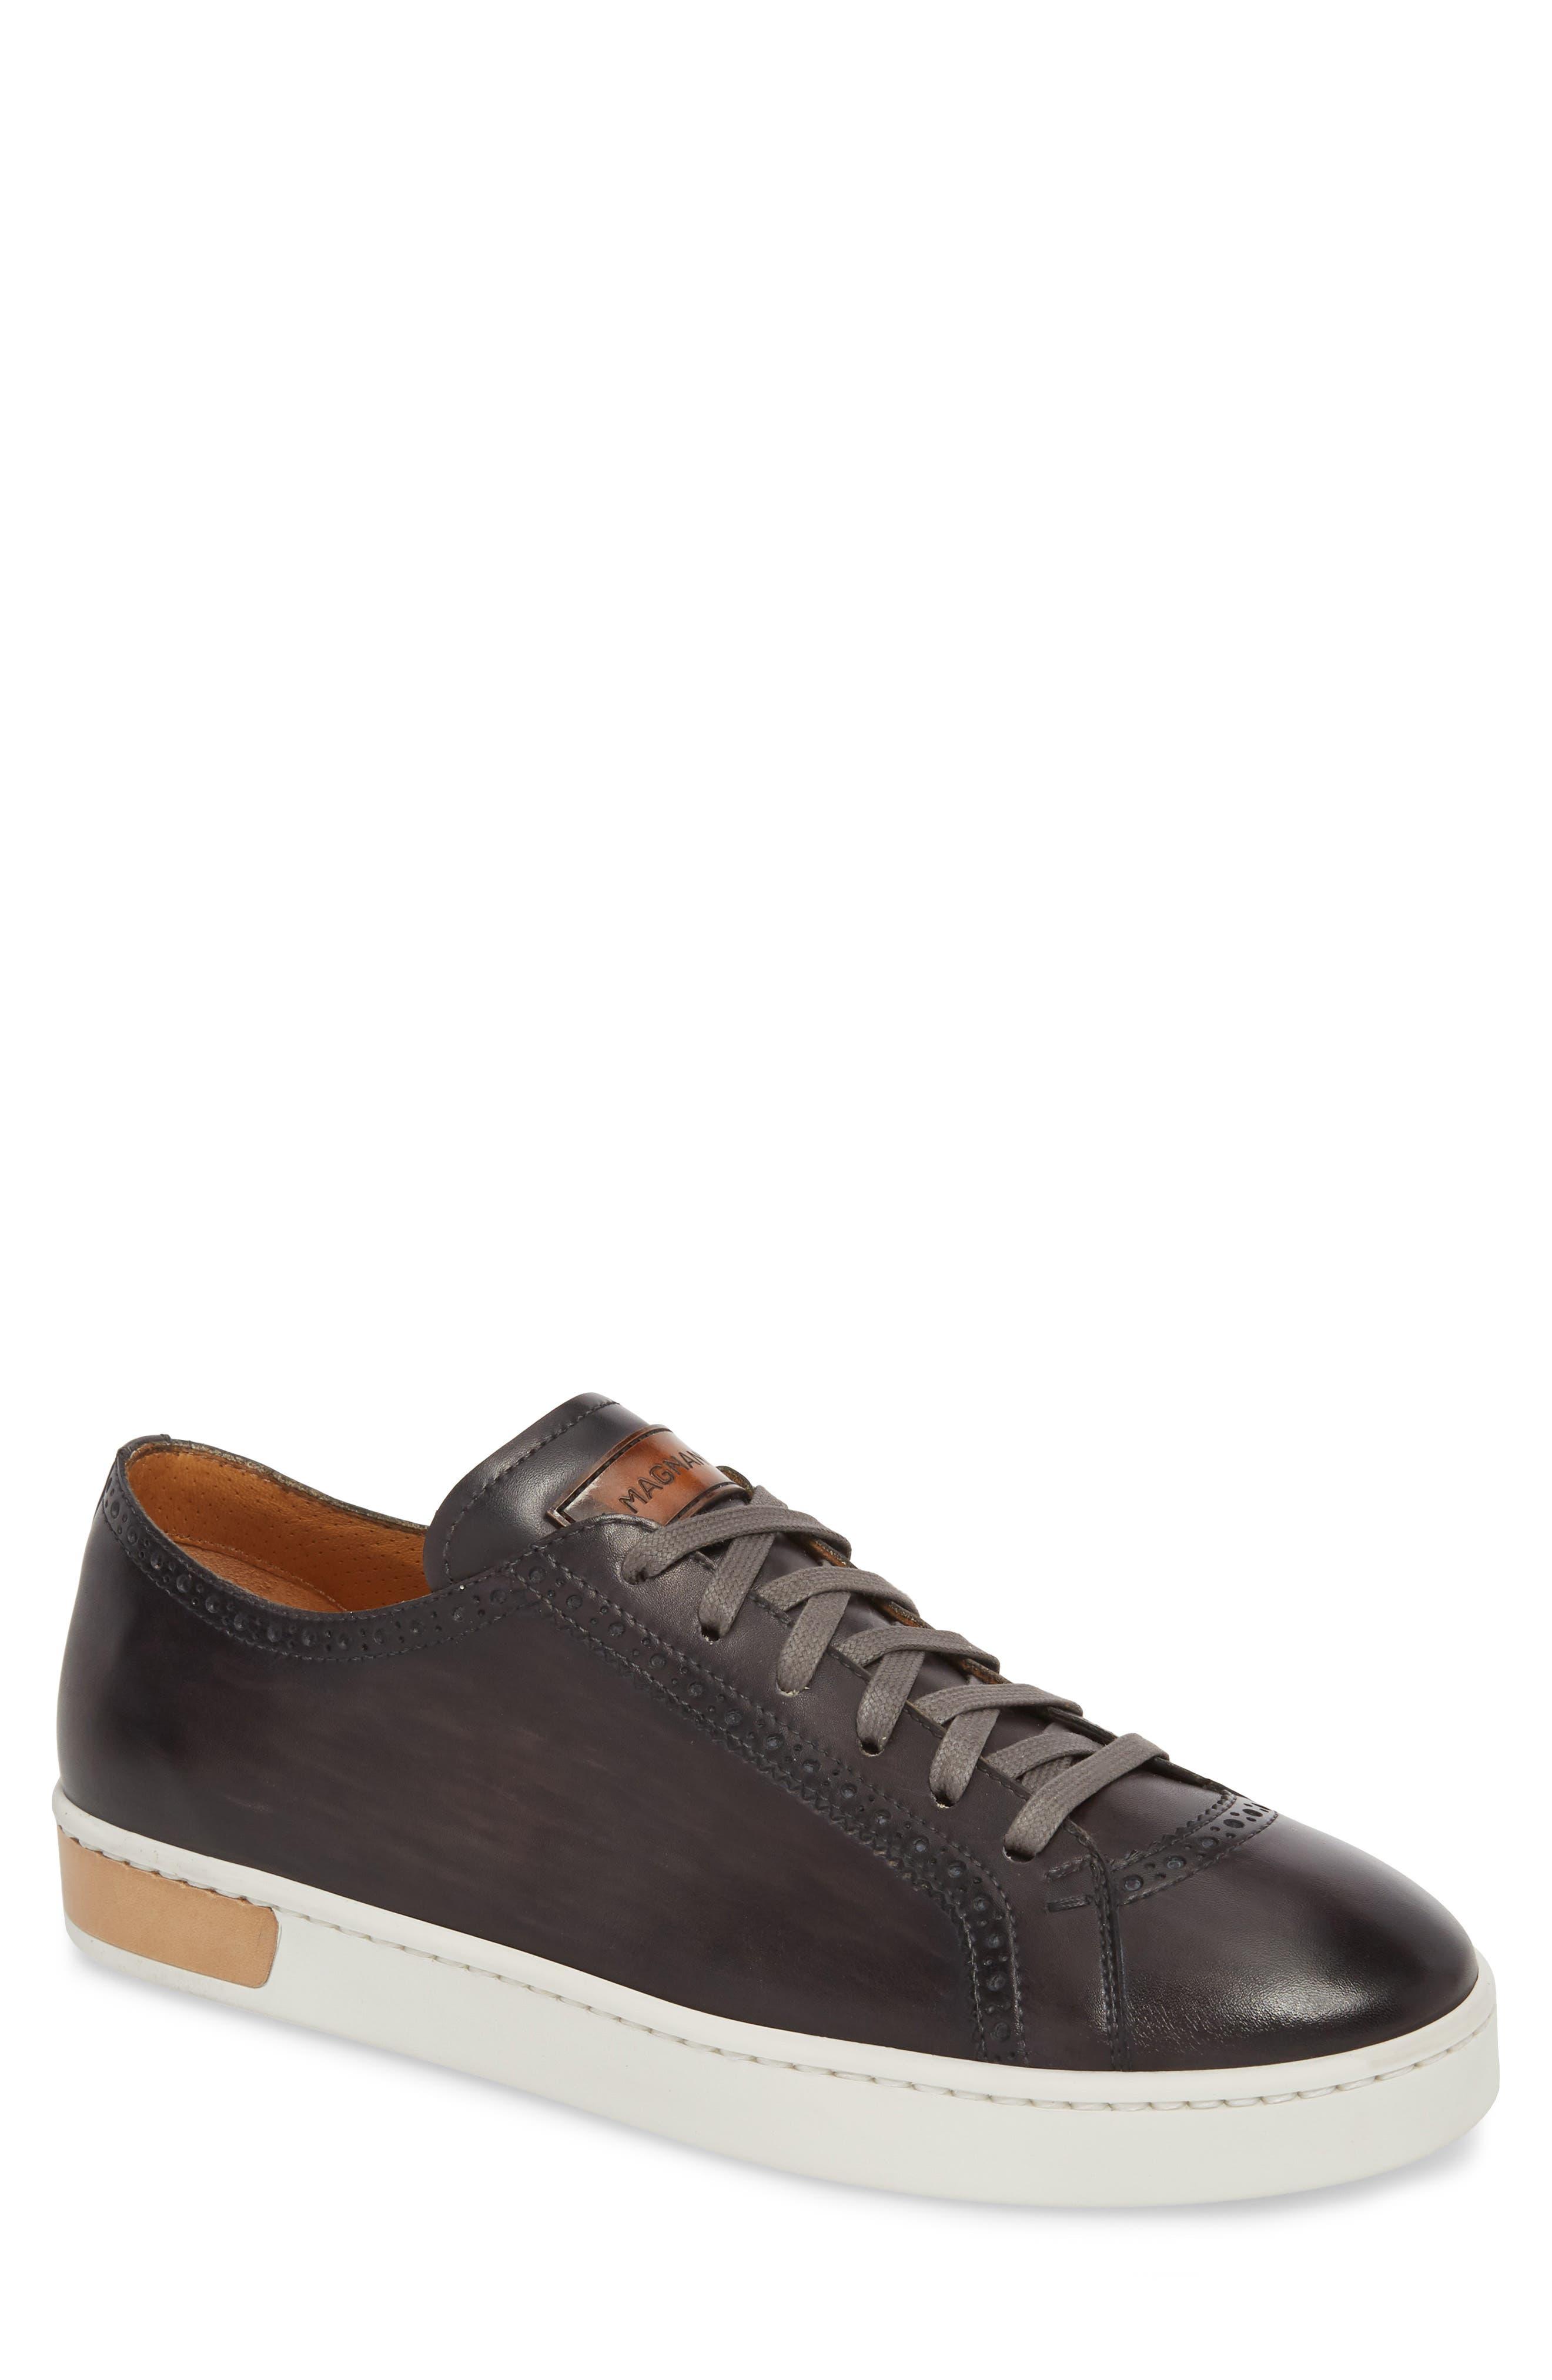 Juniper Brogued Low Top Sneaker,                         Main,                         color, Grey Leather